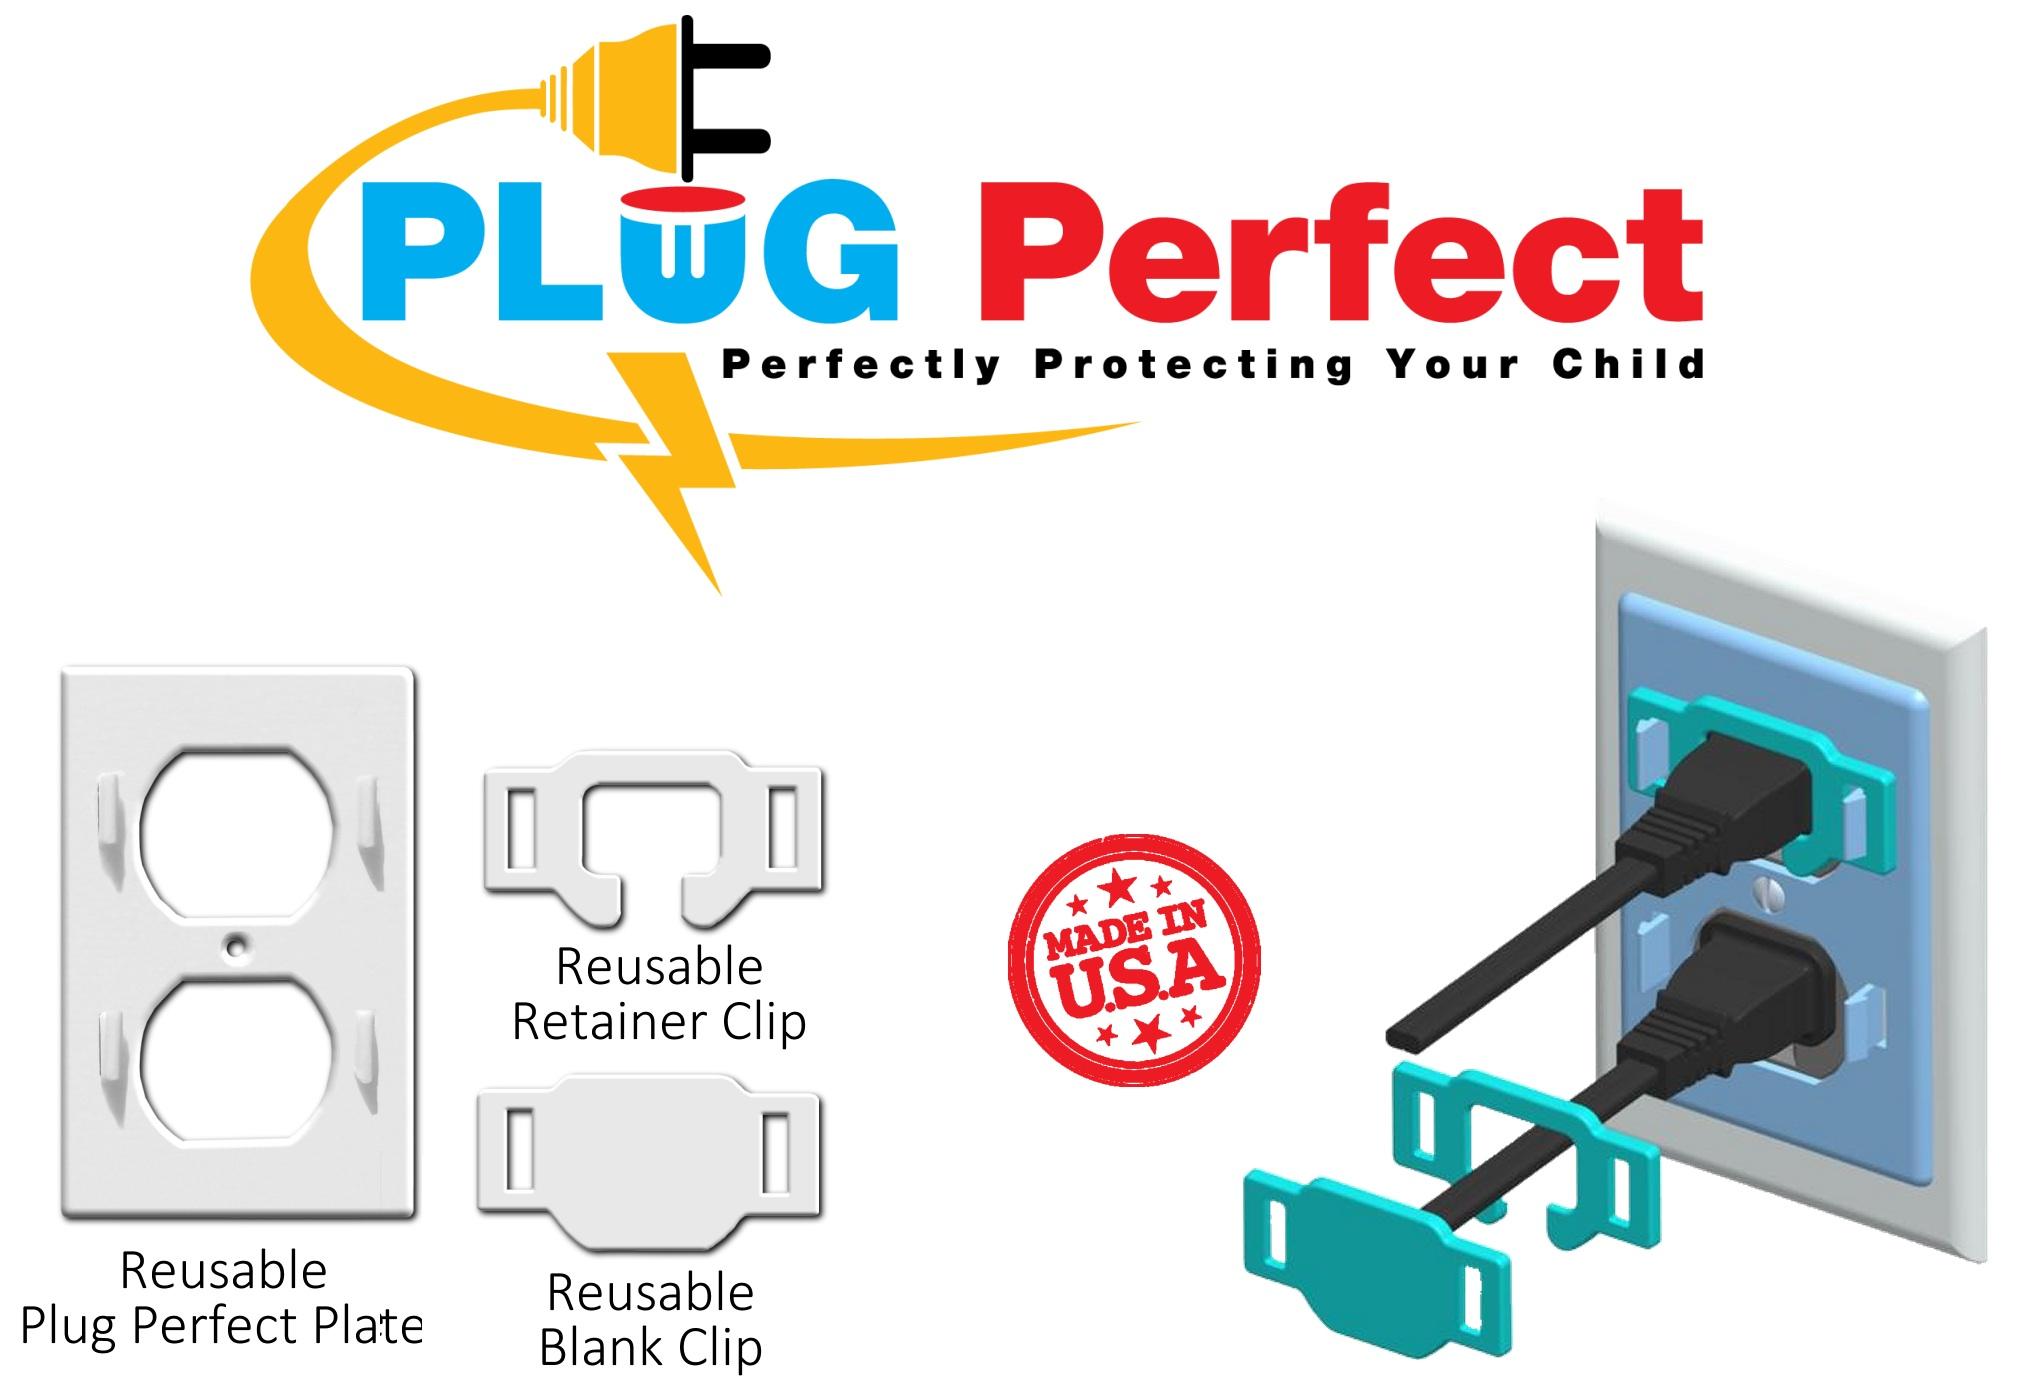 Plug Perfect